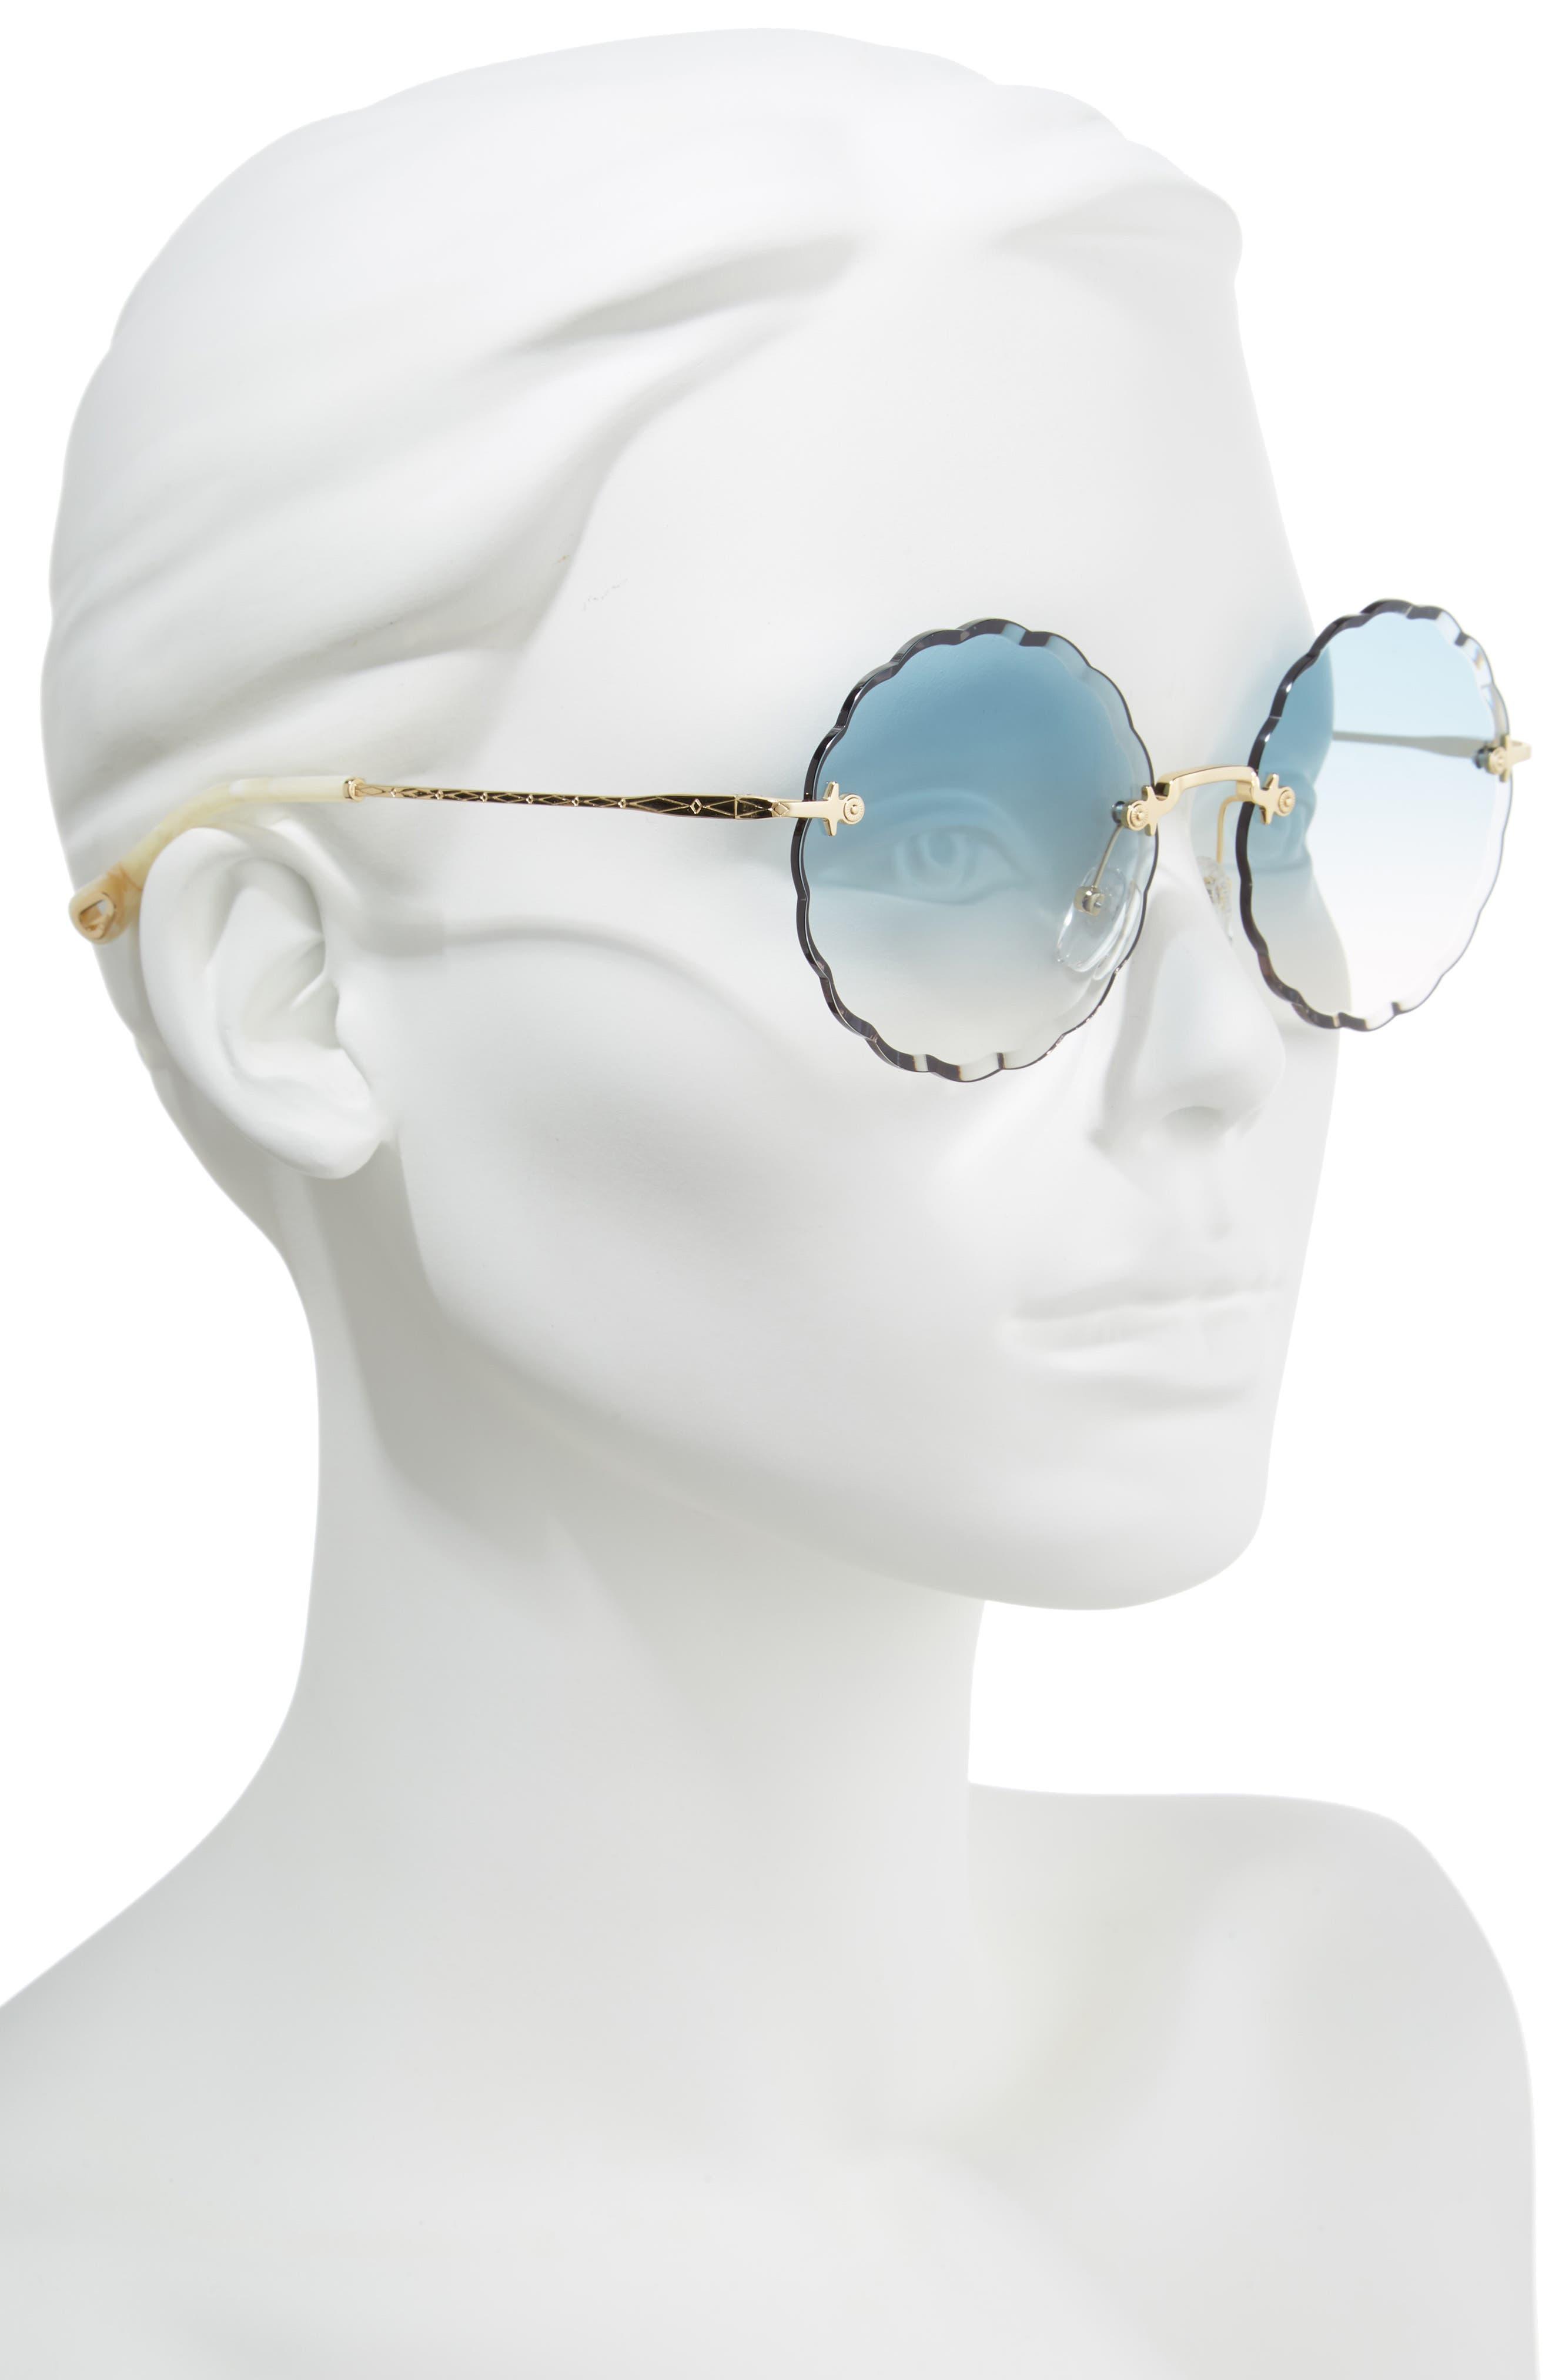 Rosie 60mm Scalloped Rimless Sunglasses,                             Alternate thumbnail 2, color,                             GOLD/ GRADIENT BLUE